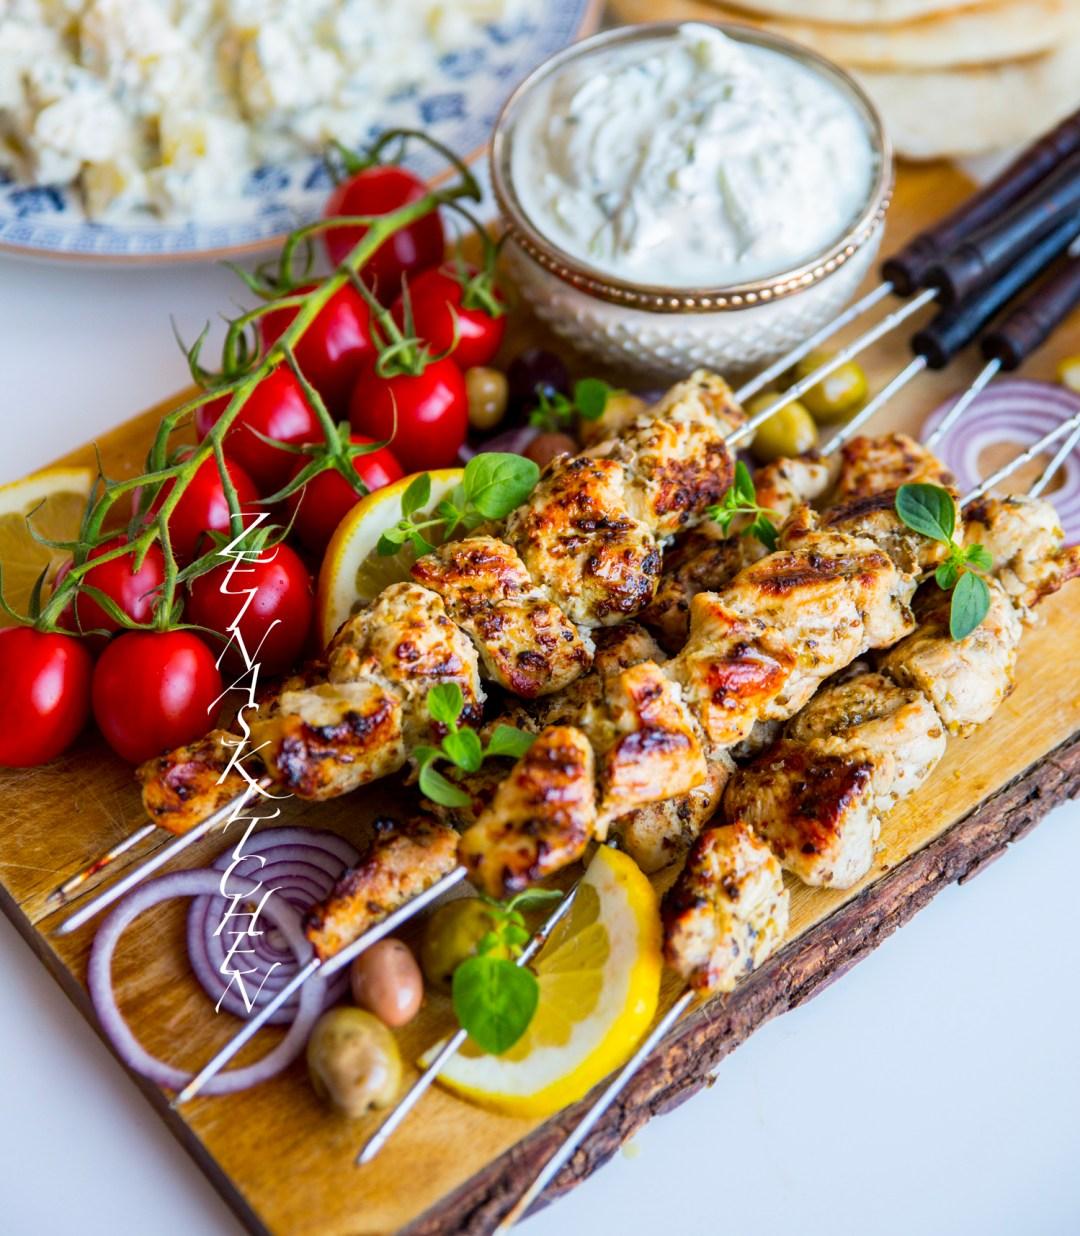 grekisk mat recept souvlaki